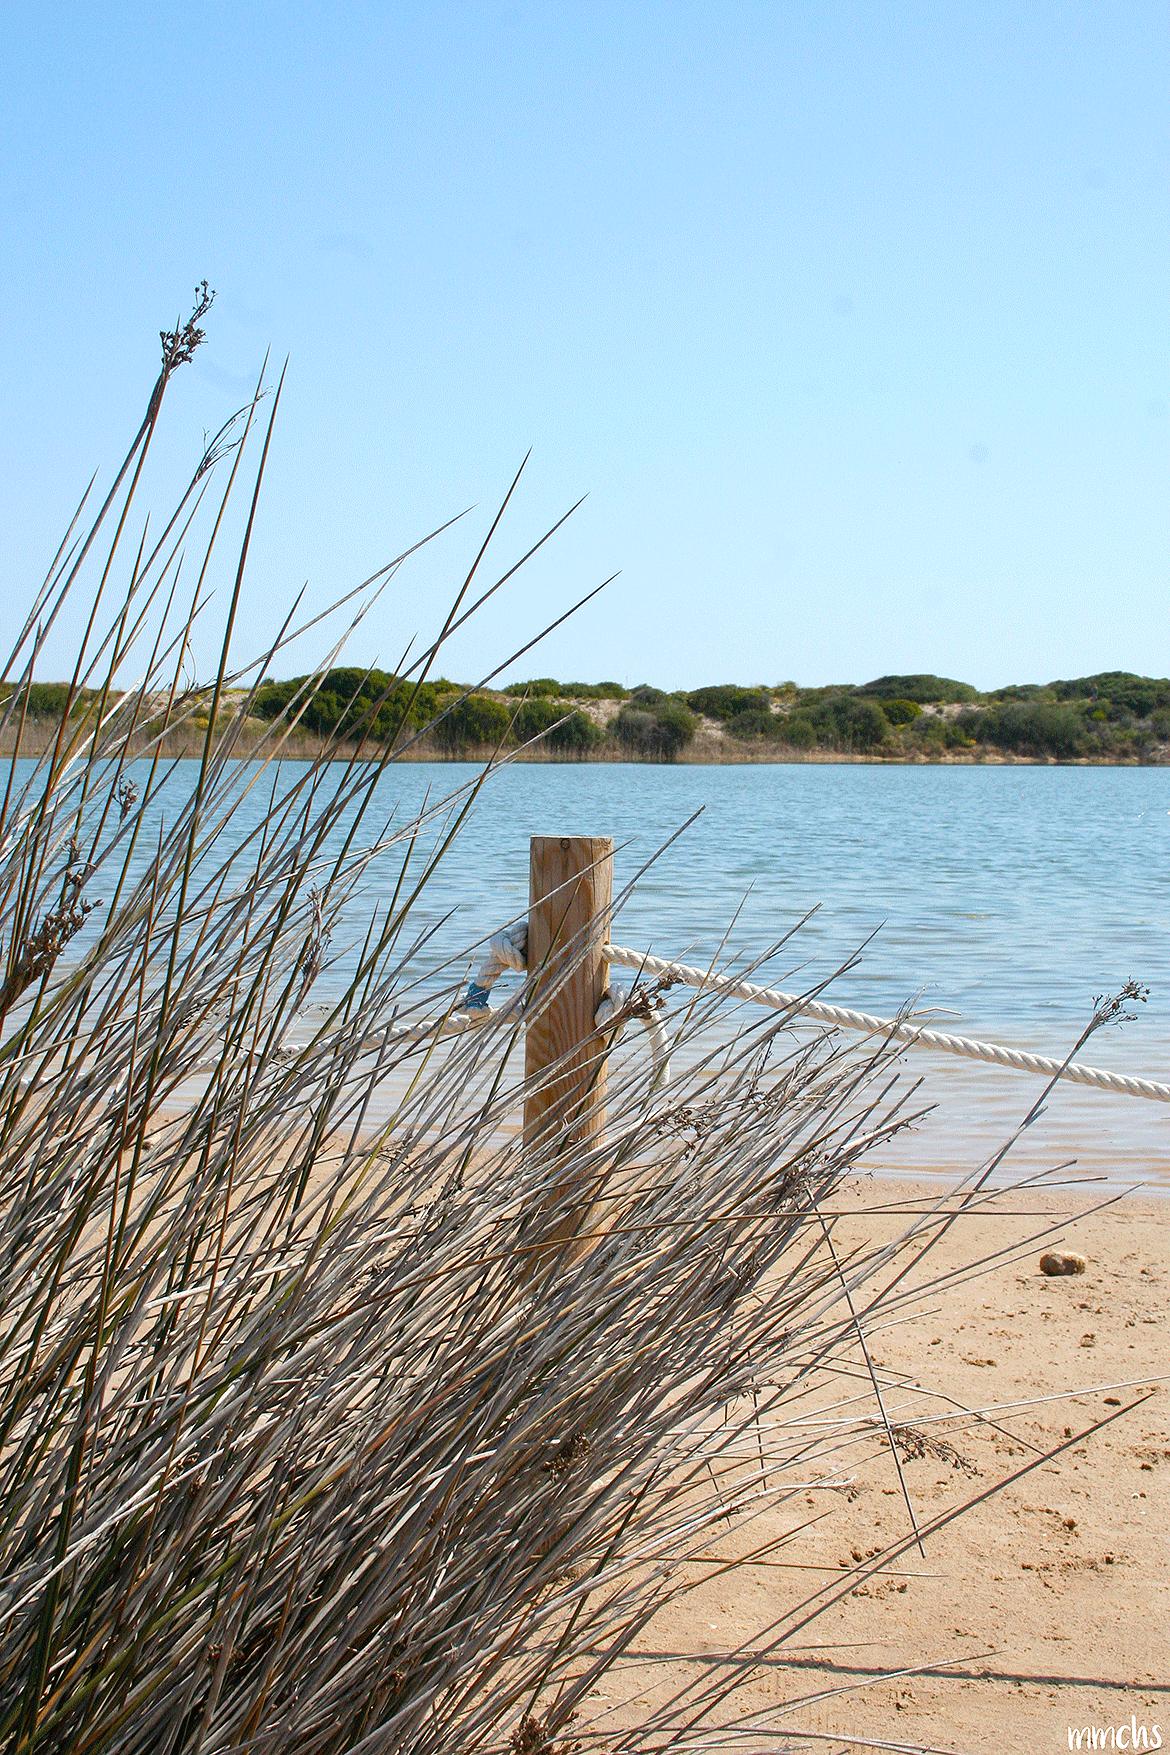 lago de Pujol la Dehesa el Saler